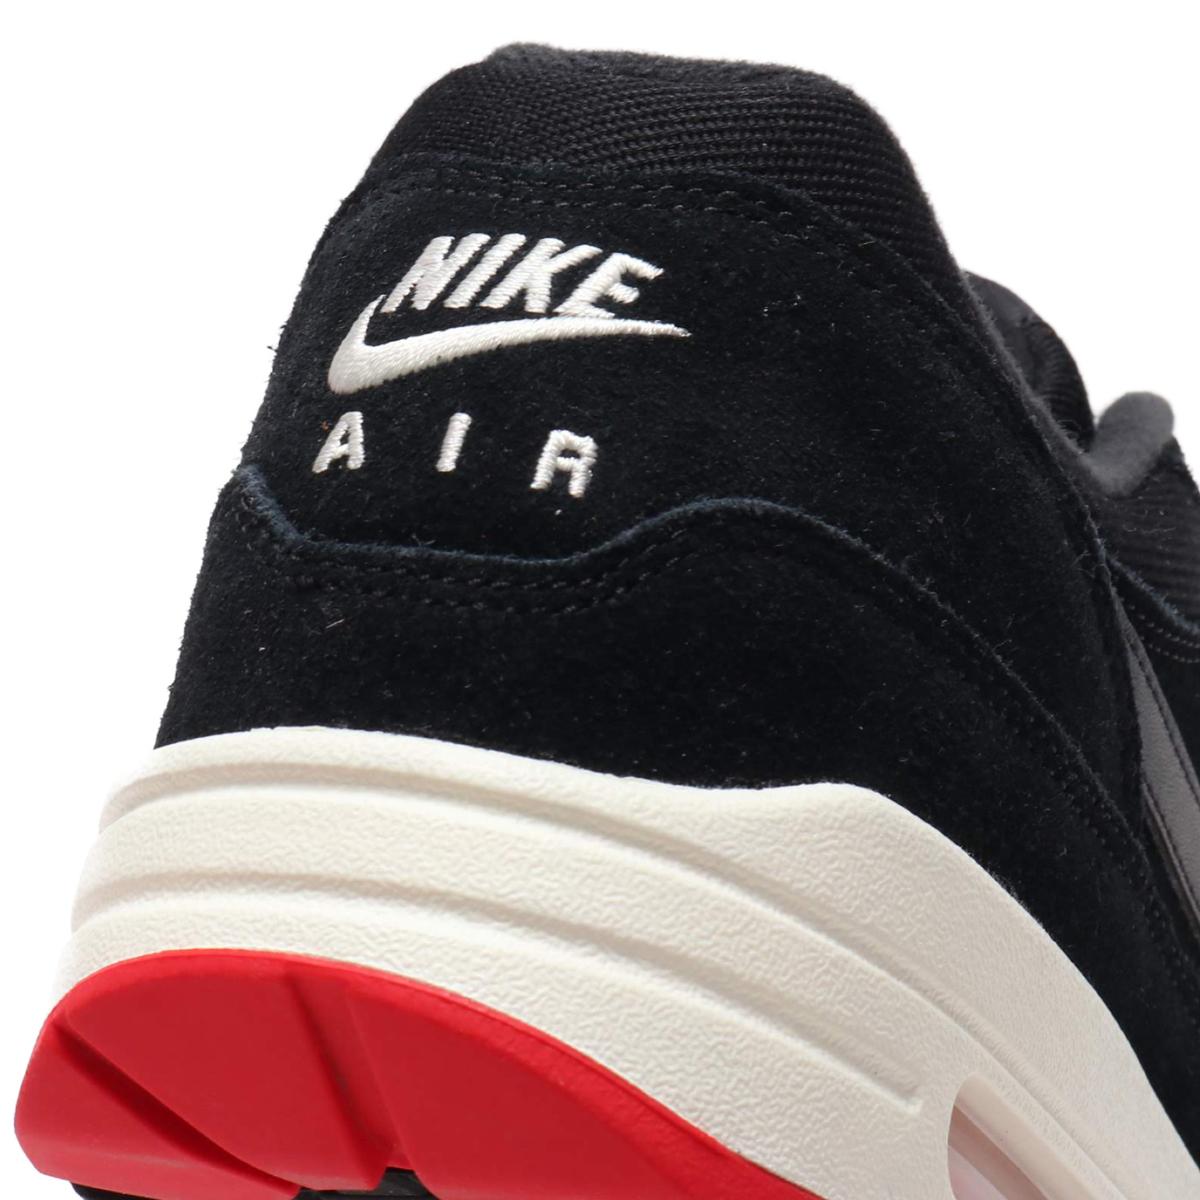 sports shoes d310b 41146 ... NIKE AIR MAX 1 PREMIUM (Kie Ney AMAX 1 premium) BLACK OIL GREY